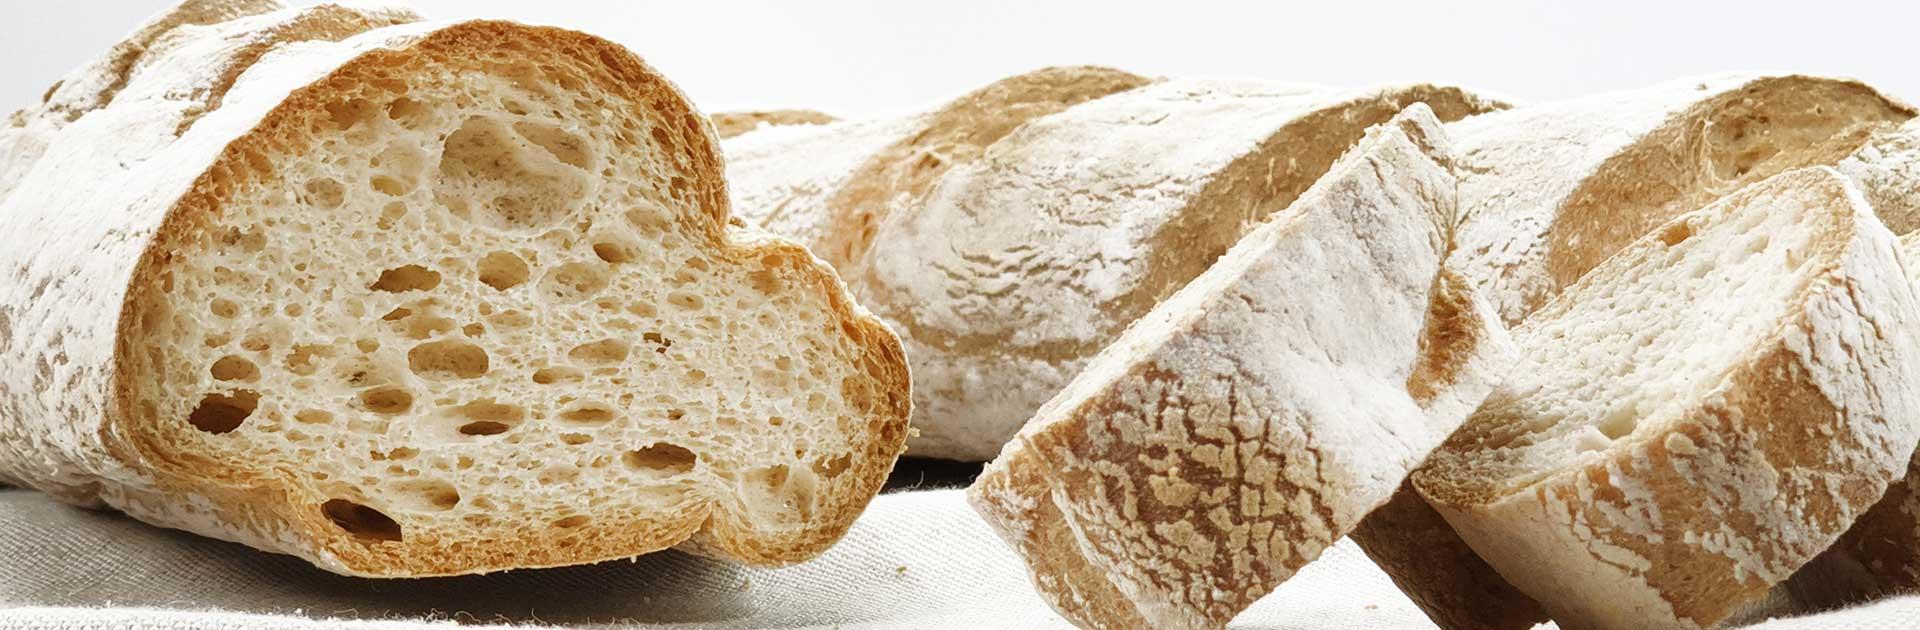 Brotbackmischungen low carb, glutenfrei, sojafrei